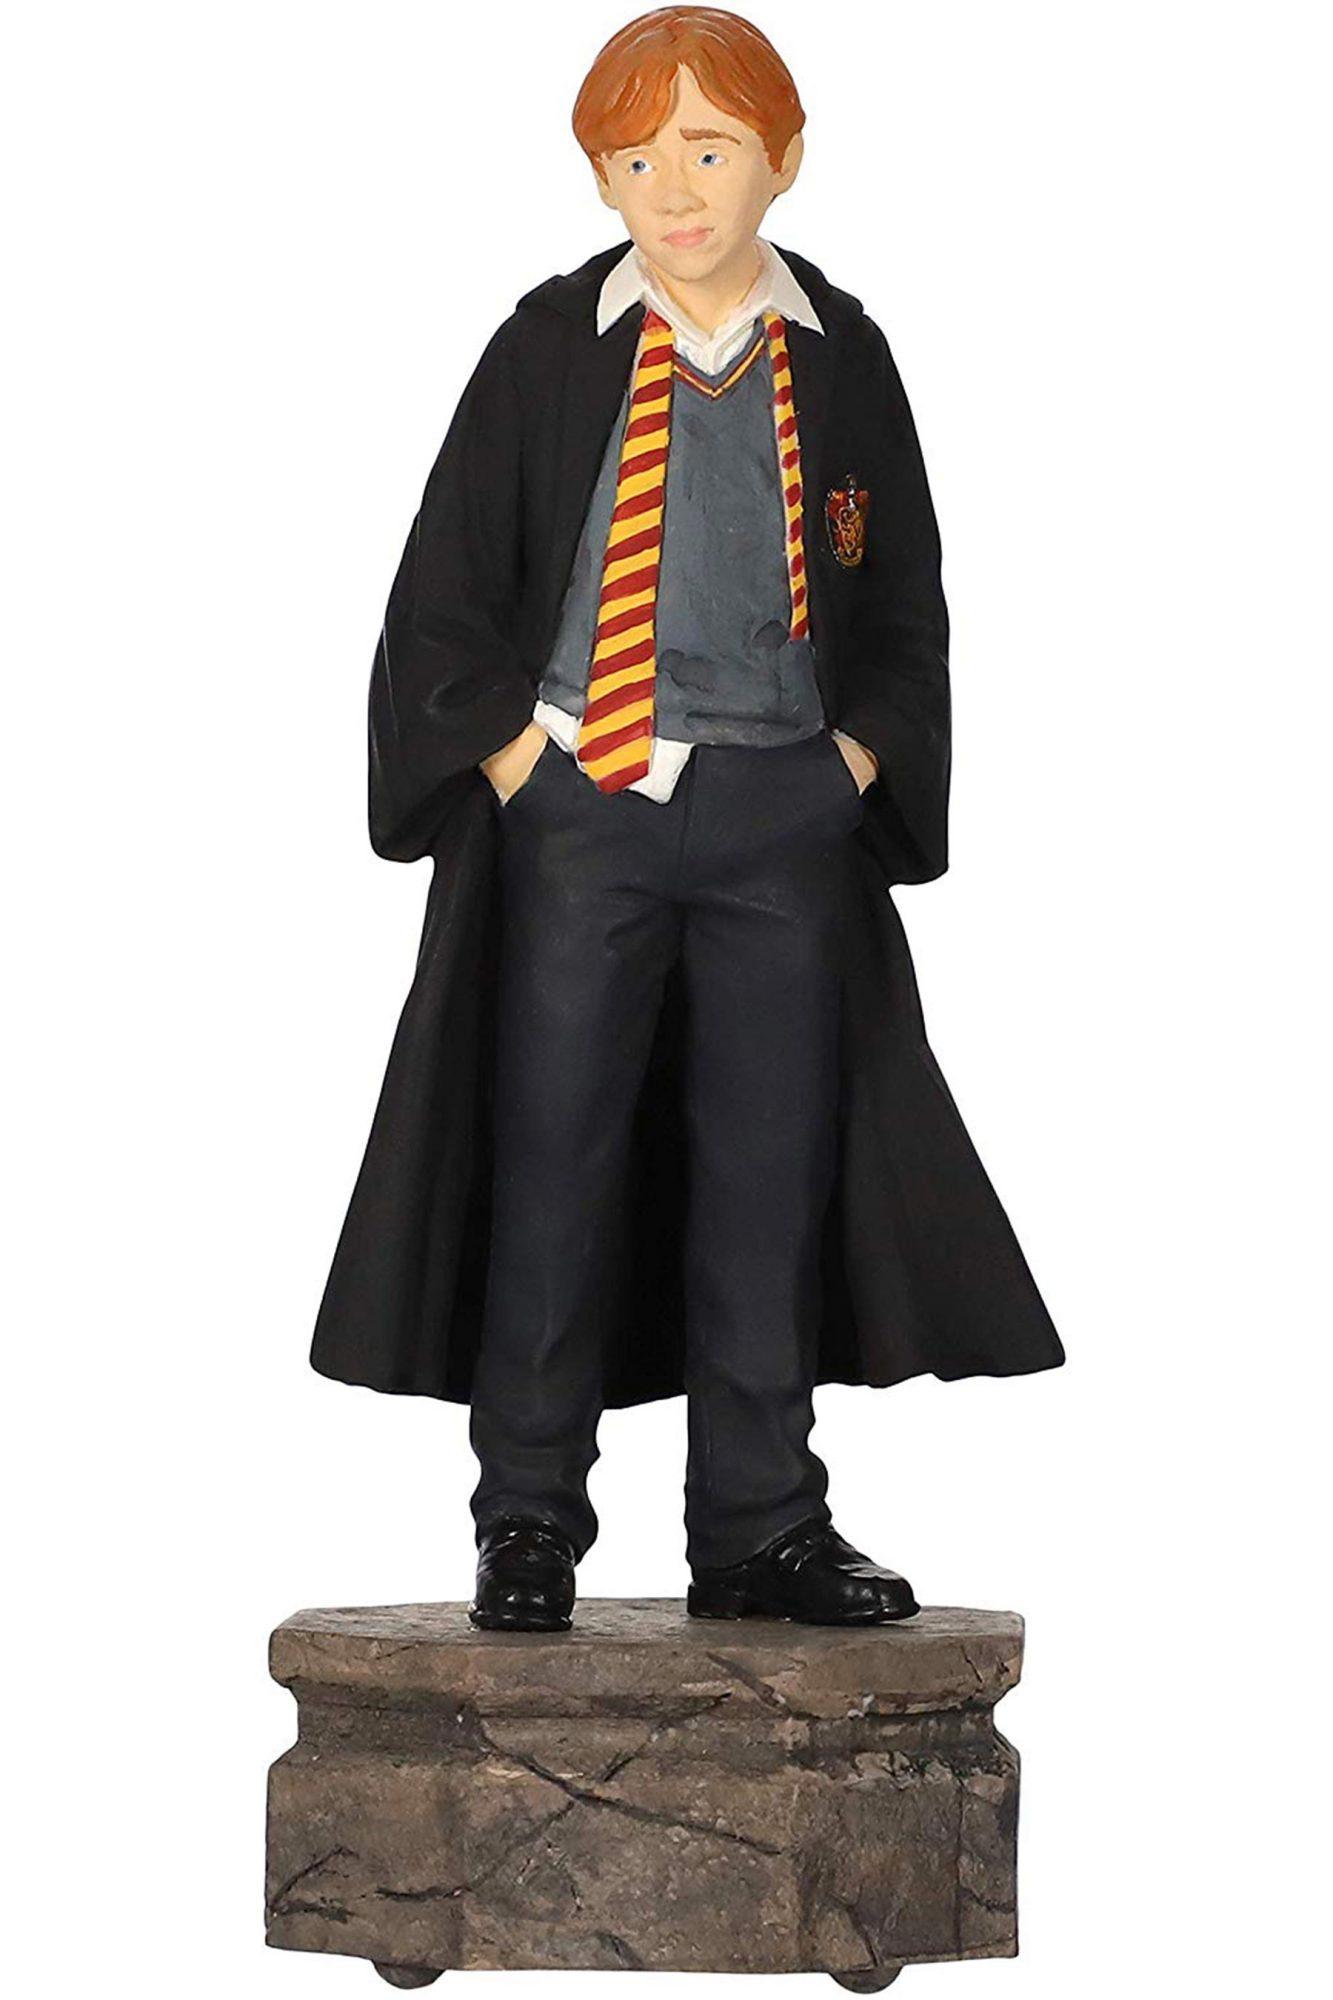 Hallmark Keepsake Christmas Ornament 2019 Ron Weasley with Light and Sound on Amazon